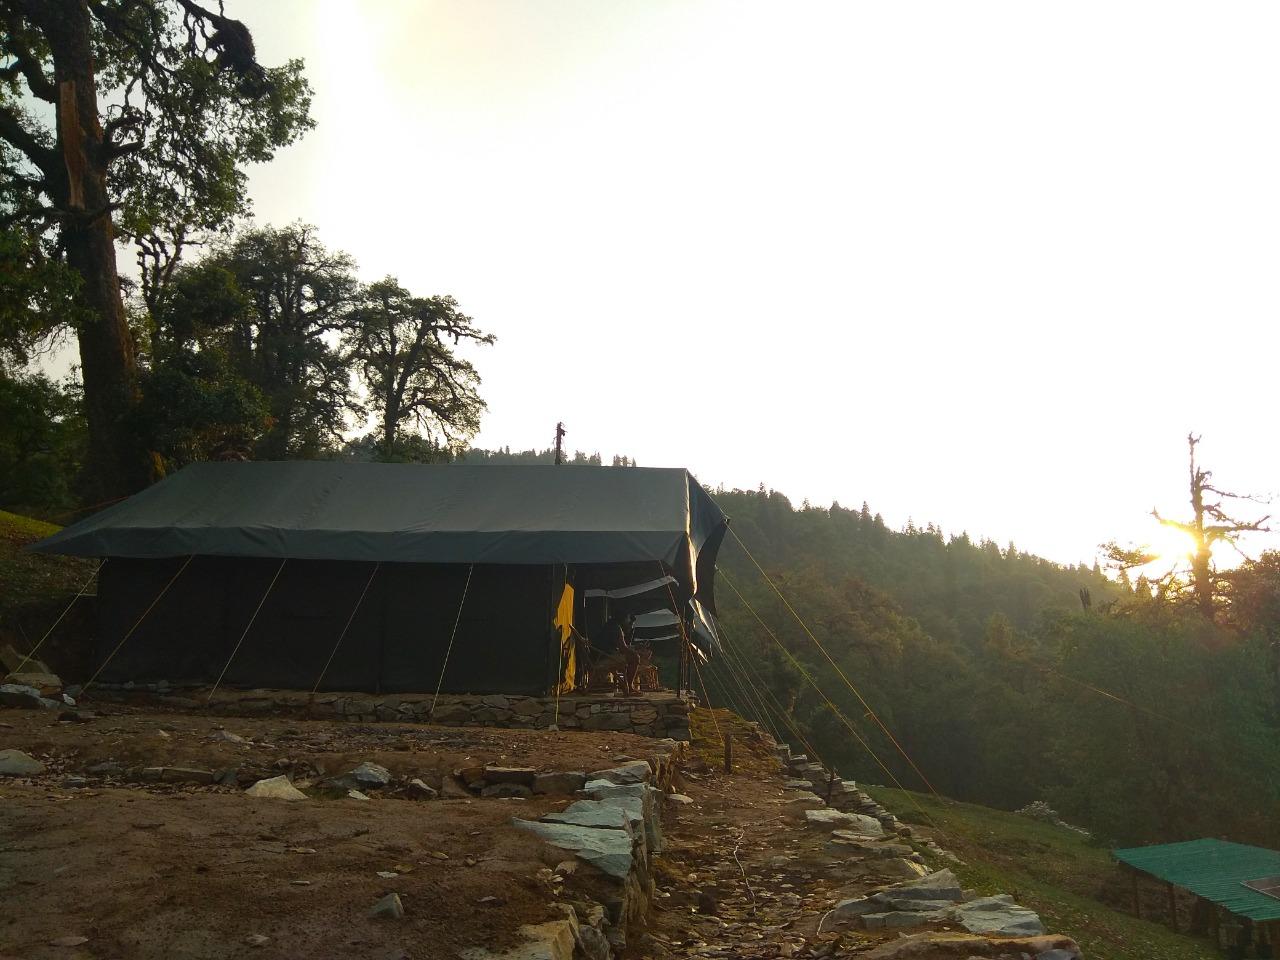 tent pitched at deoriatal trek campsite